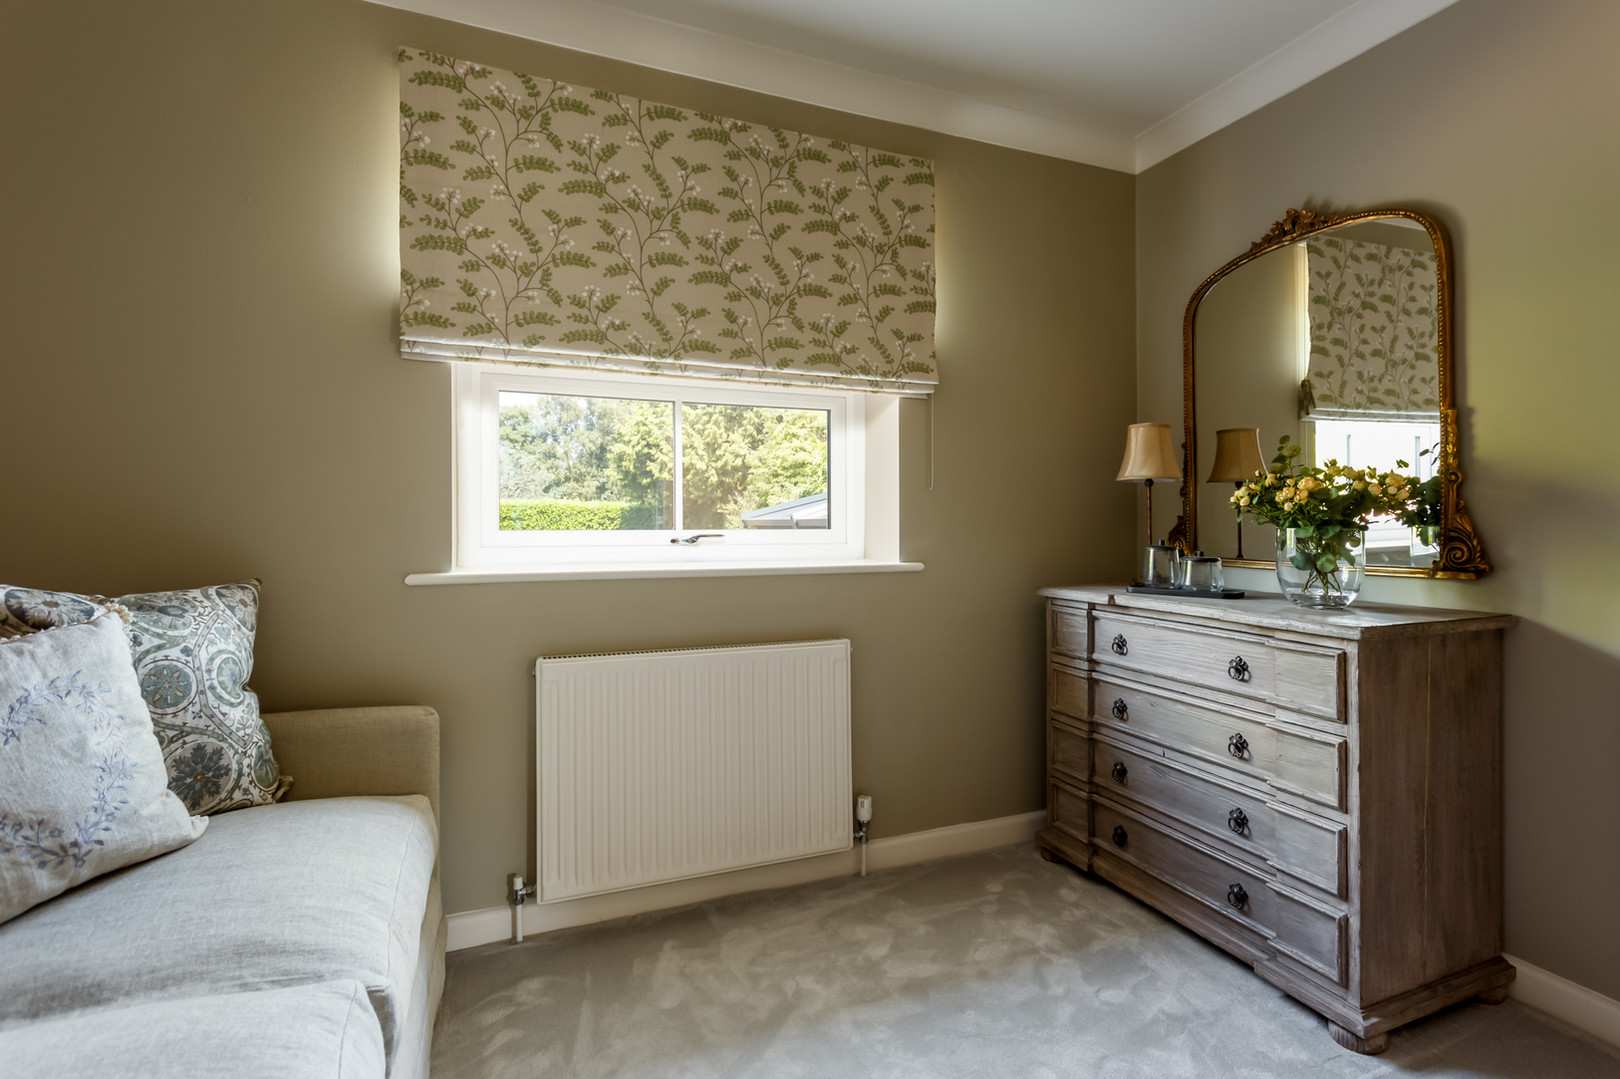 spare room interior designer poole.jpg